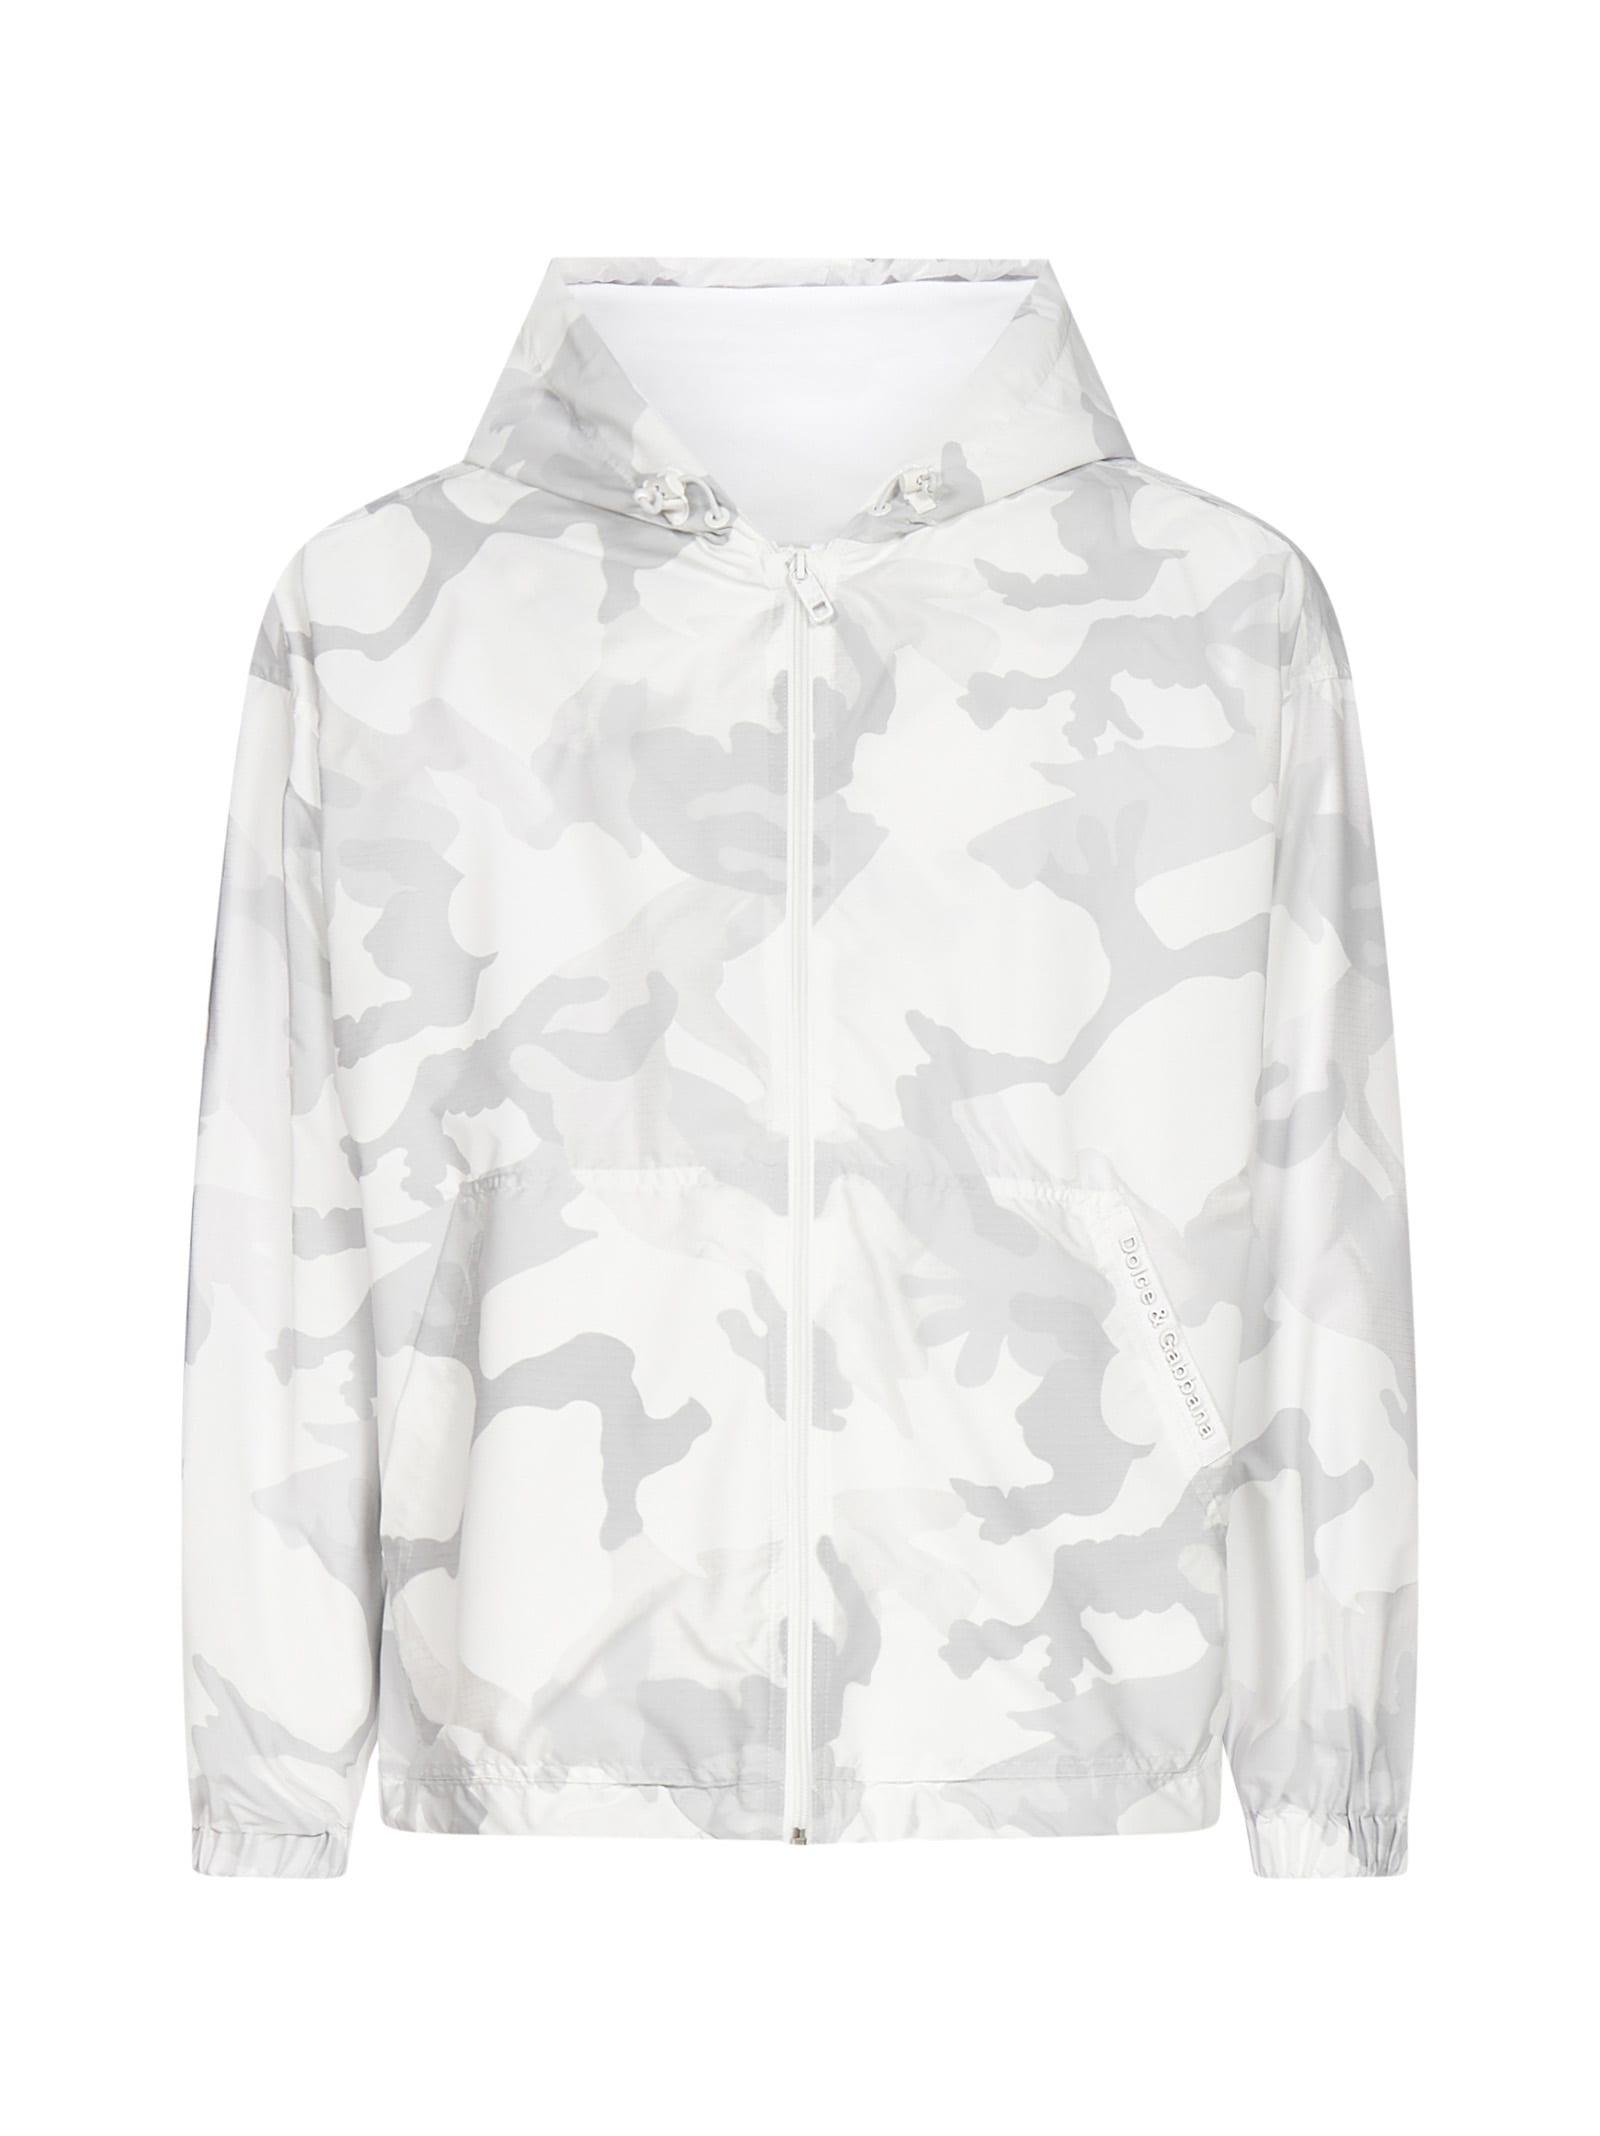 Dolce & Gabbana Jackets JACKET